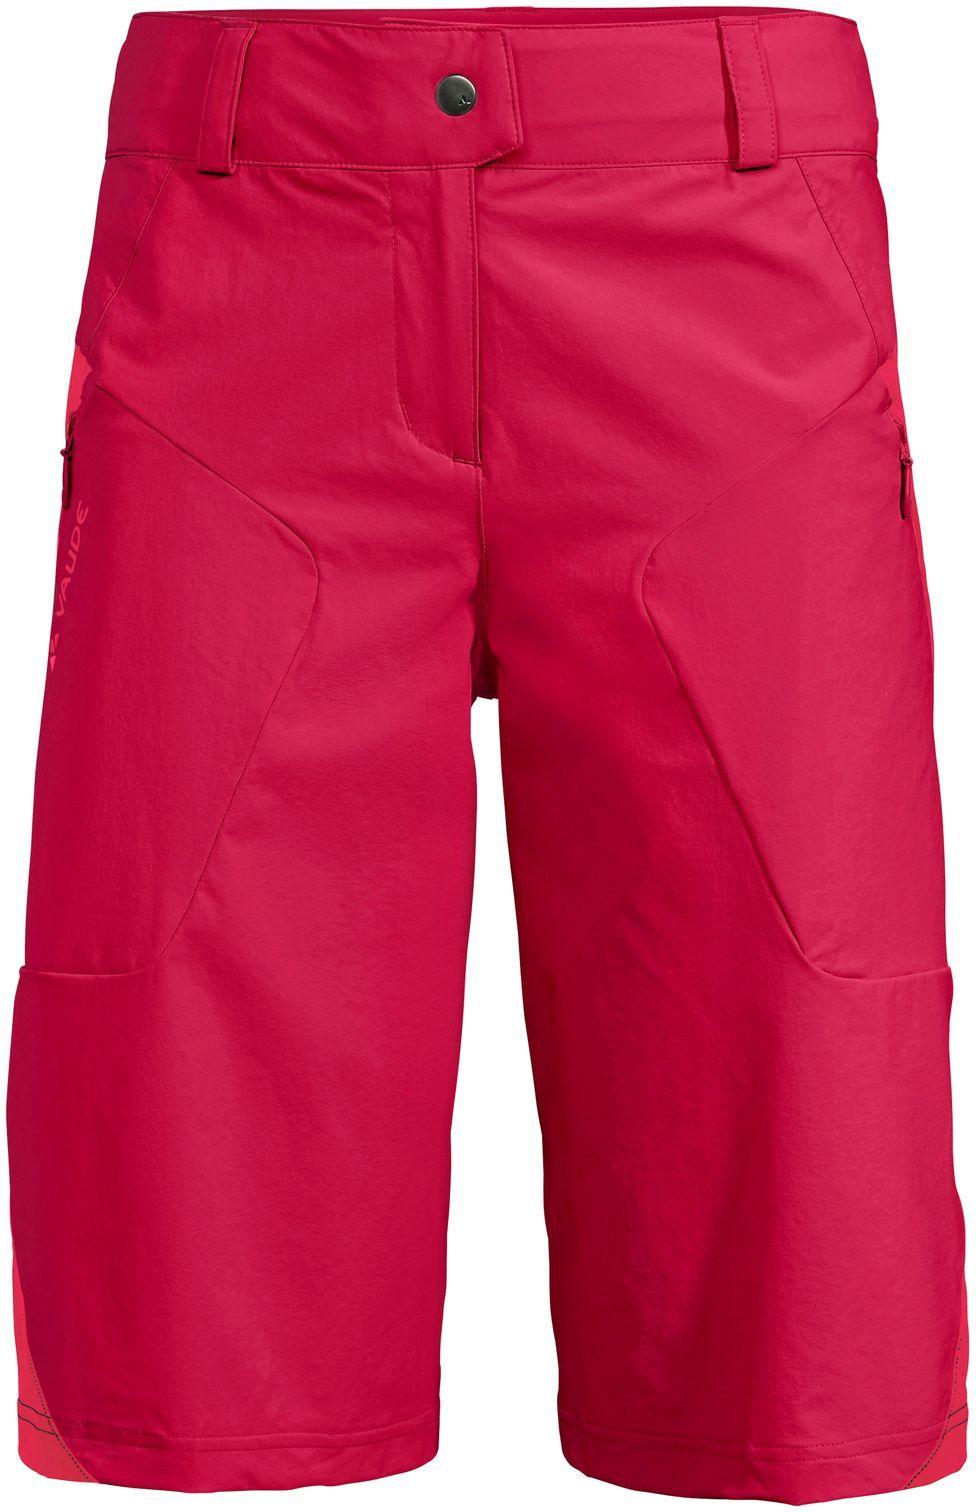 Vaude Women's Altissimo Shorts II - cranberry S